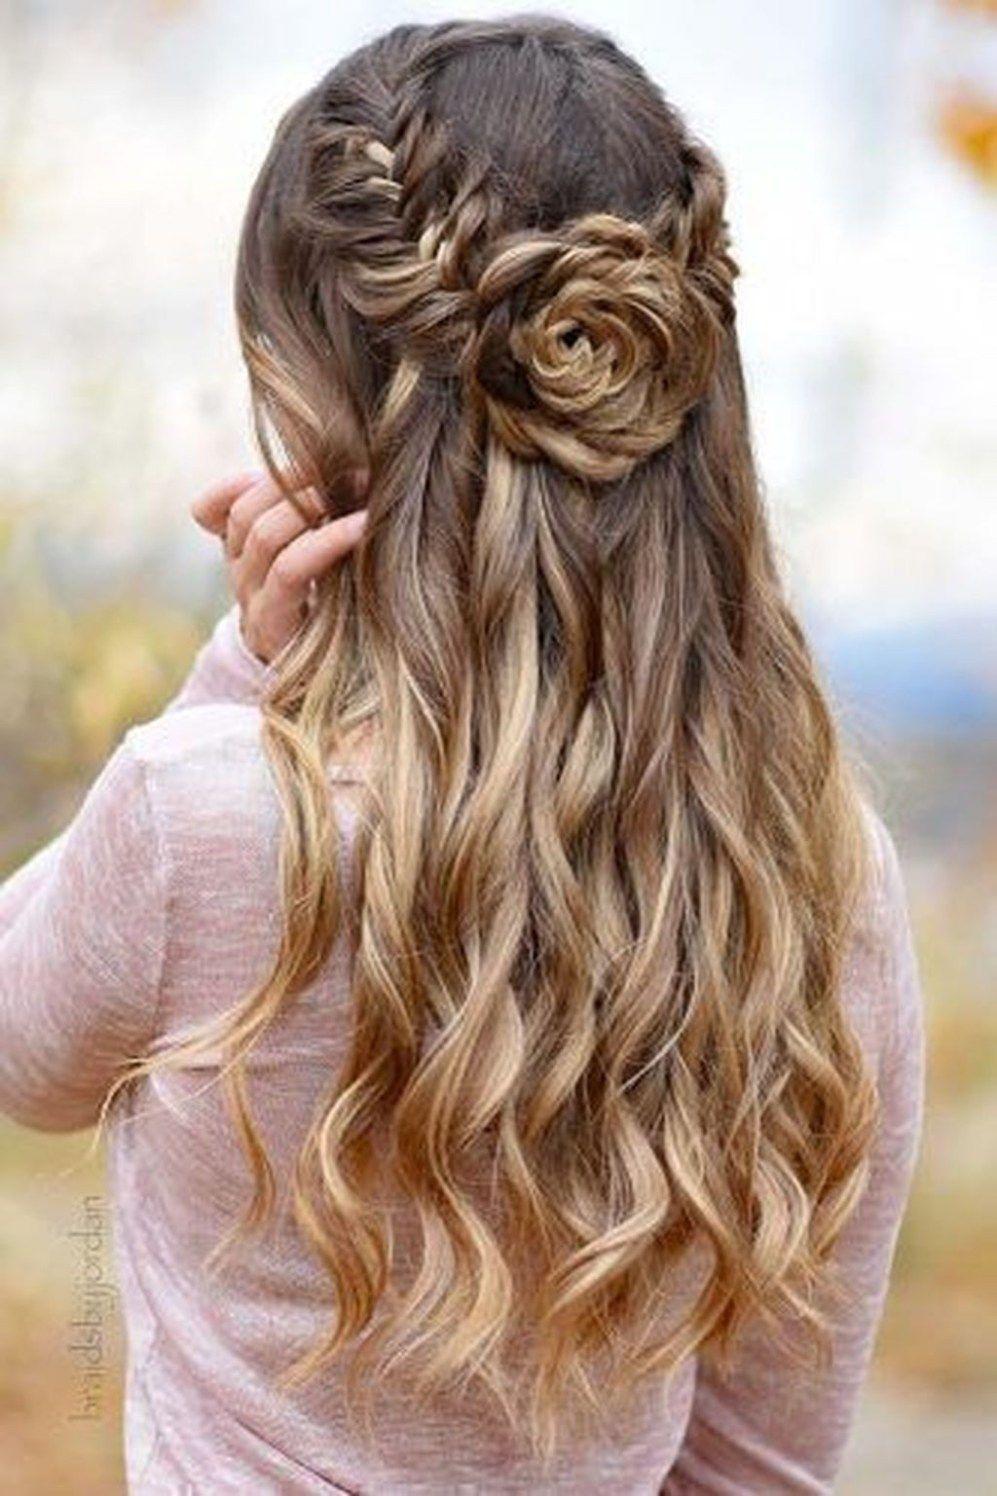 36 Amazing Half Up Half Down Wedding Hairstyles Ideas - Fashionmoe